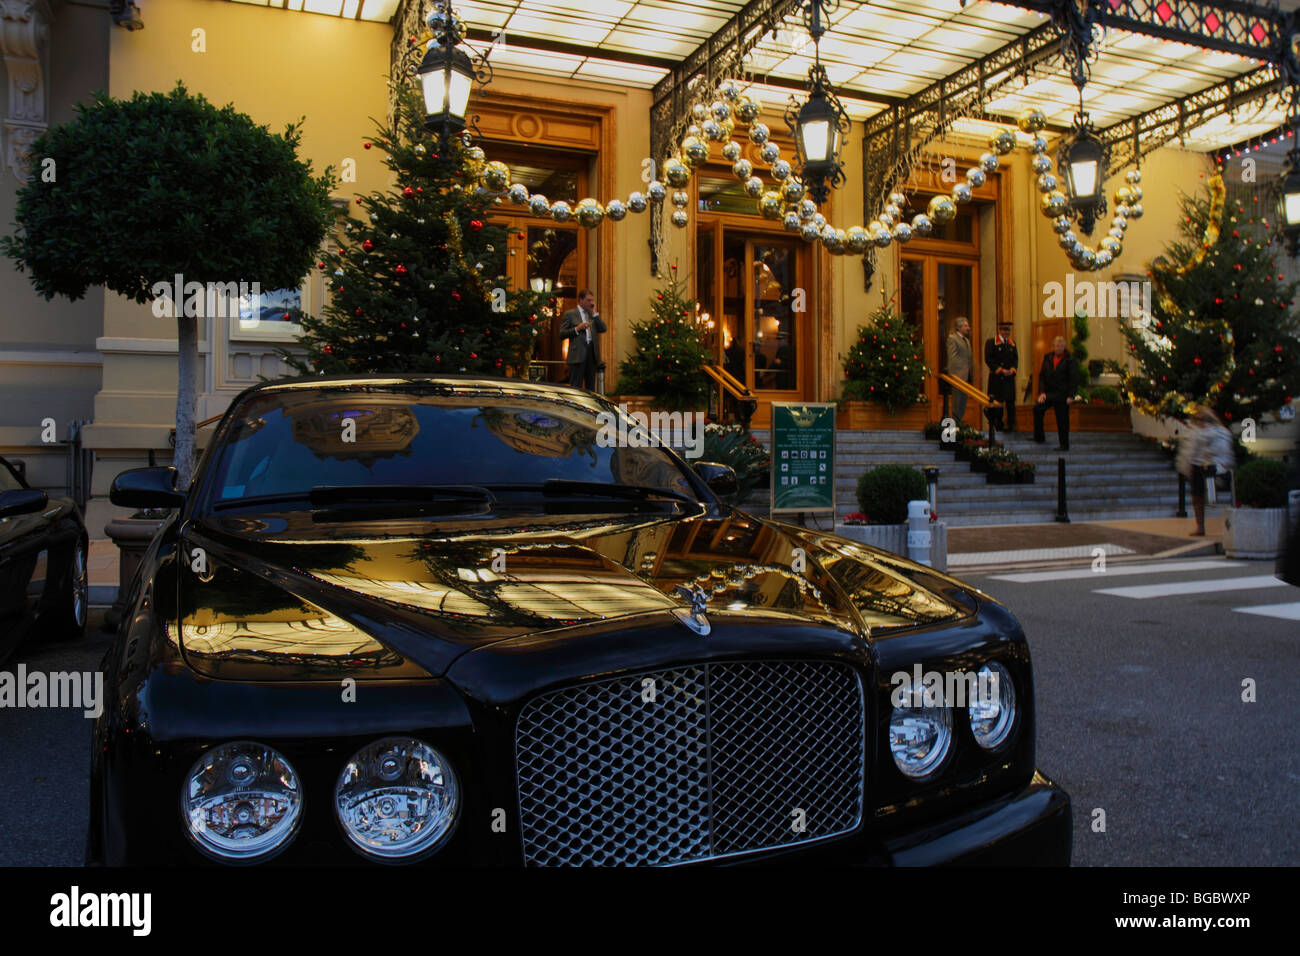 Parken monaco casino which mobile phone 2017 lise taban puanlarЖ'В± 2015 online video blog 888 casino